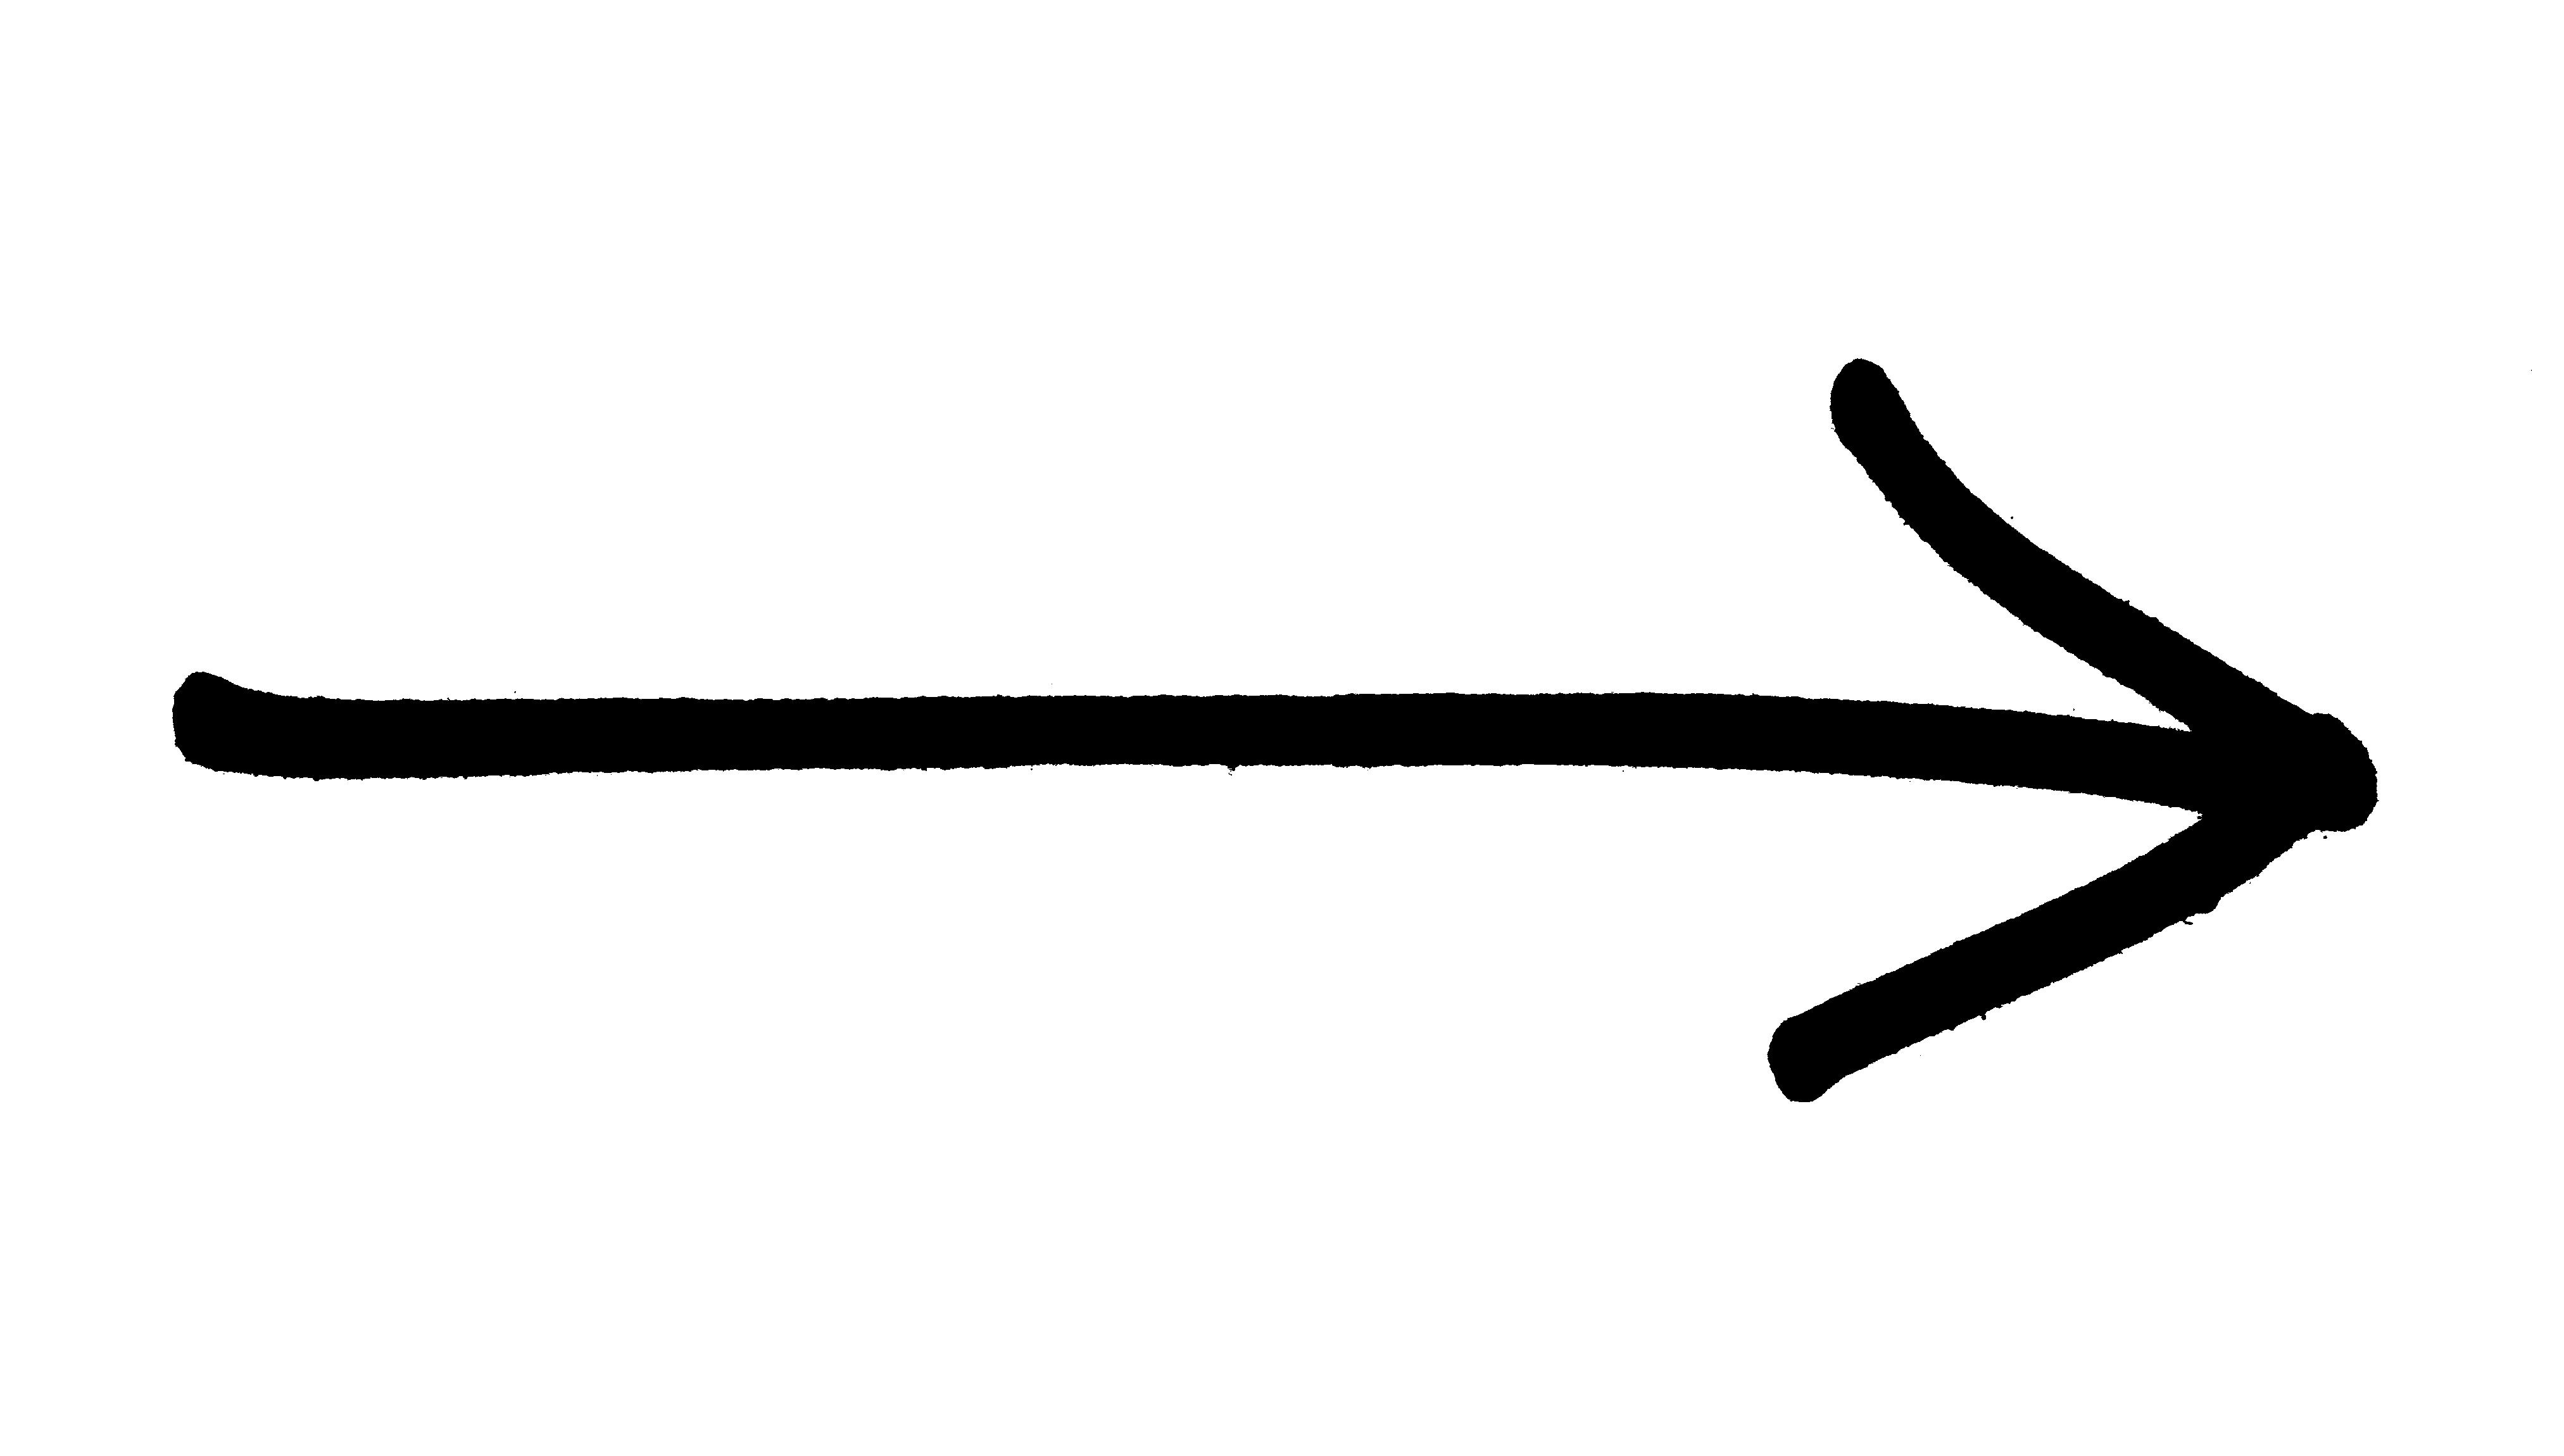 Clipart arrows single.